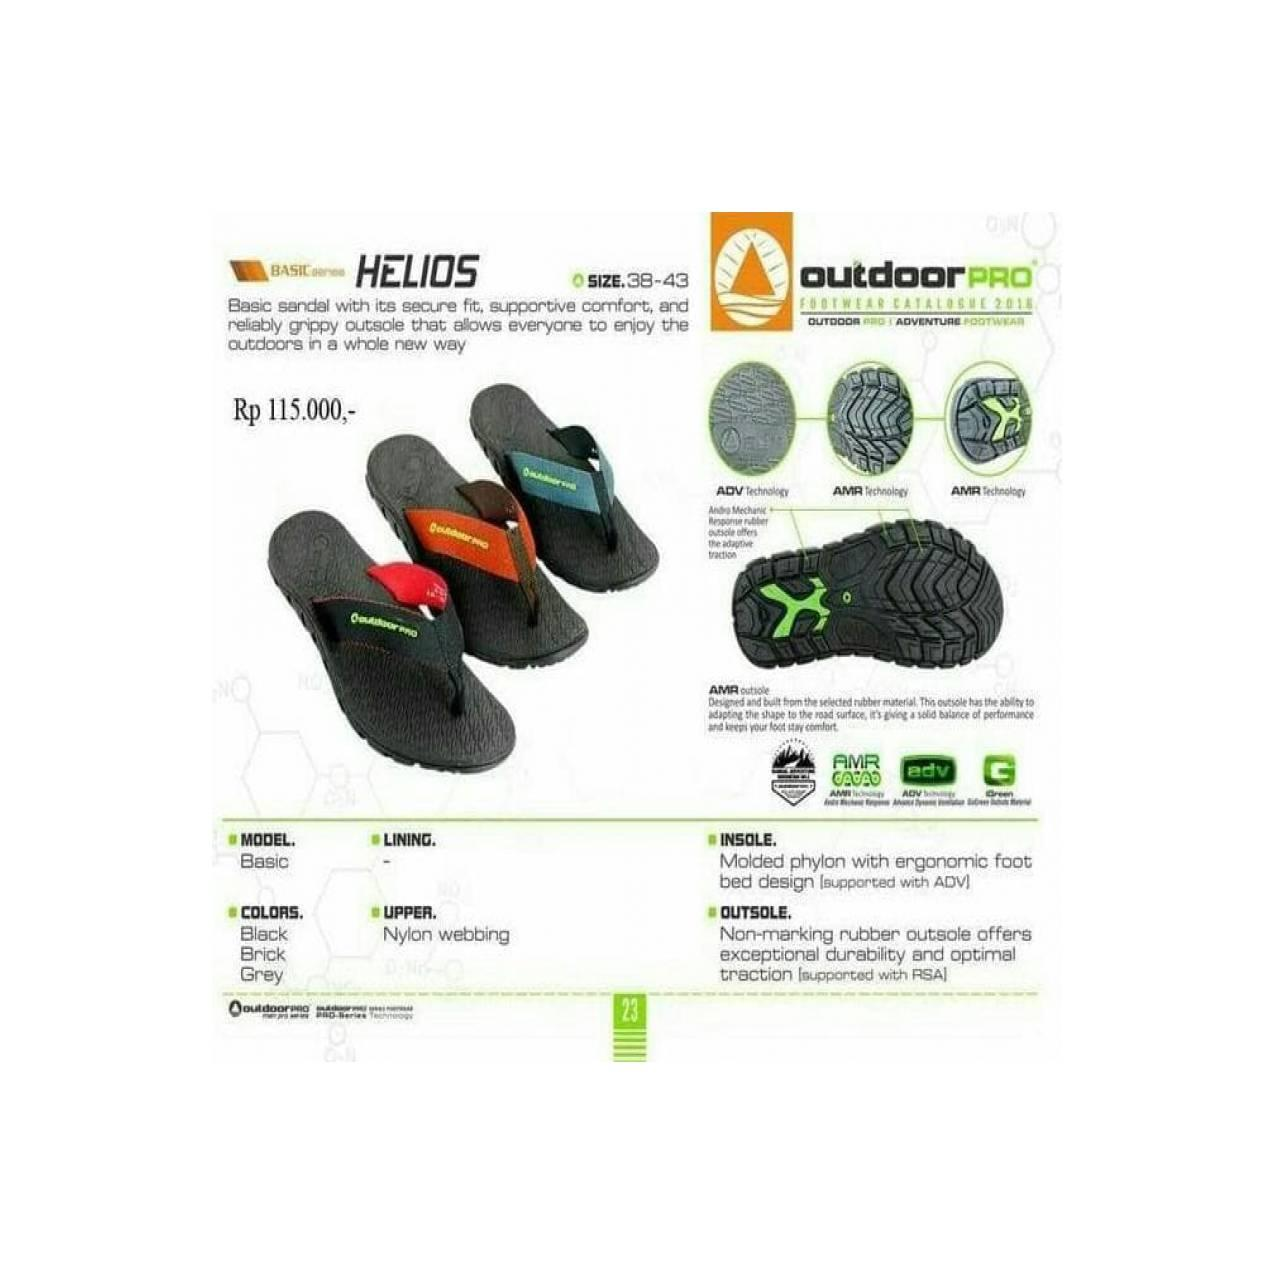 Jual Sandal Outdoor Pro Seri Helios Not Eiger Consina Rei Boogie Murah